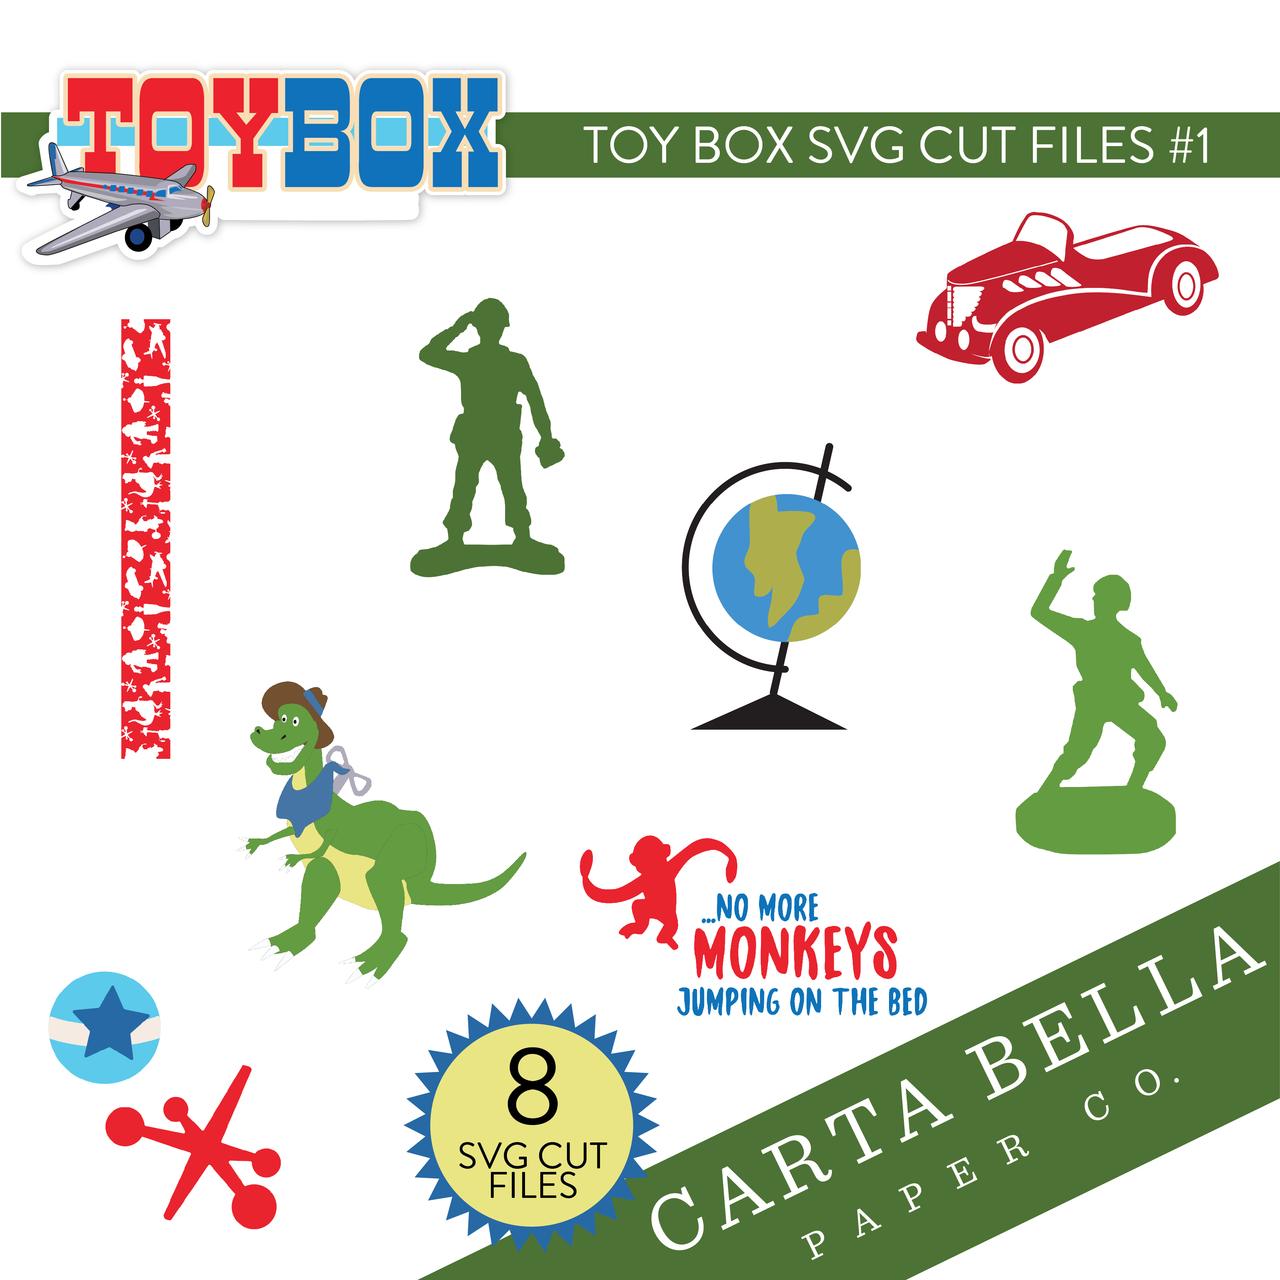 Toy Box SVG Cut Files #1